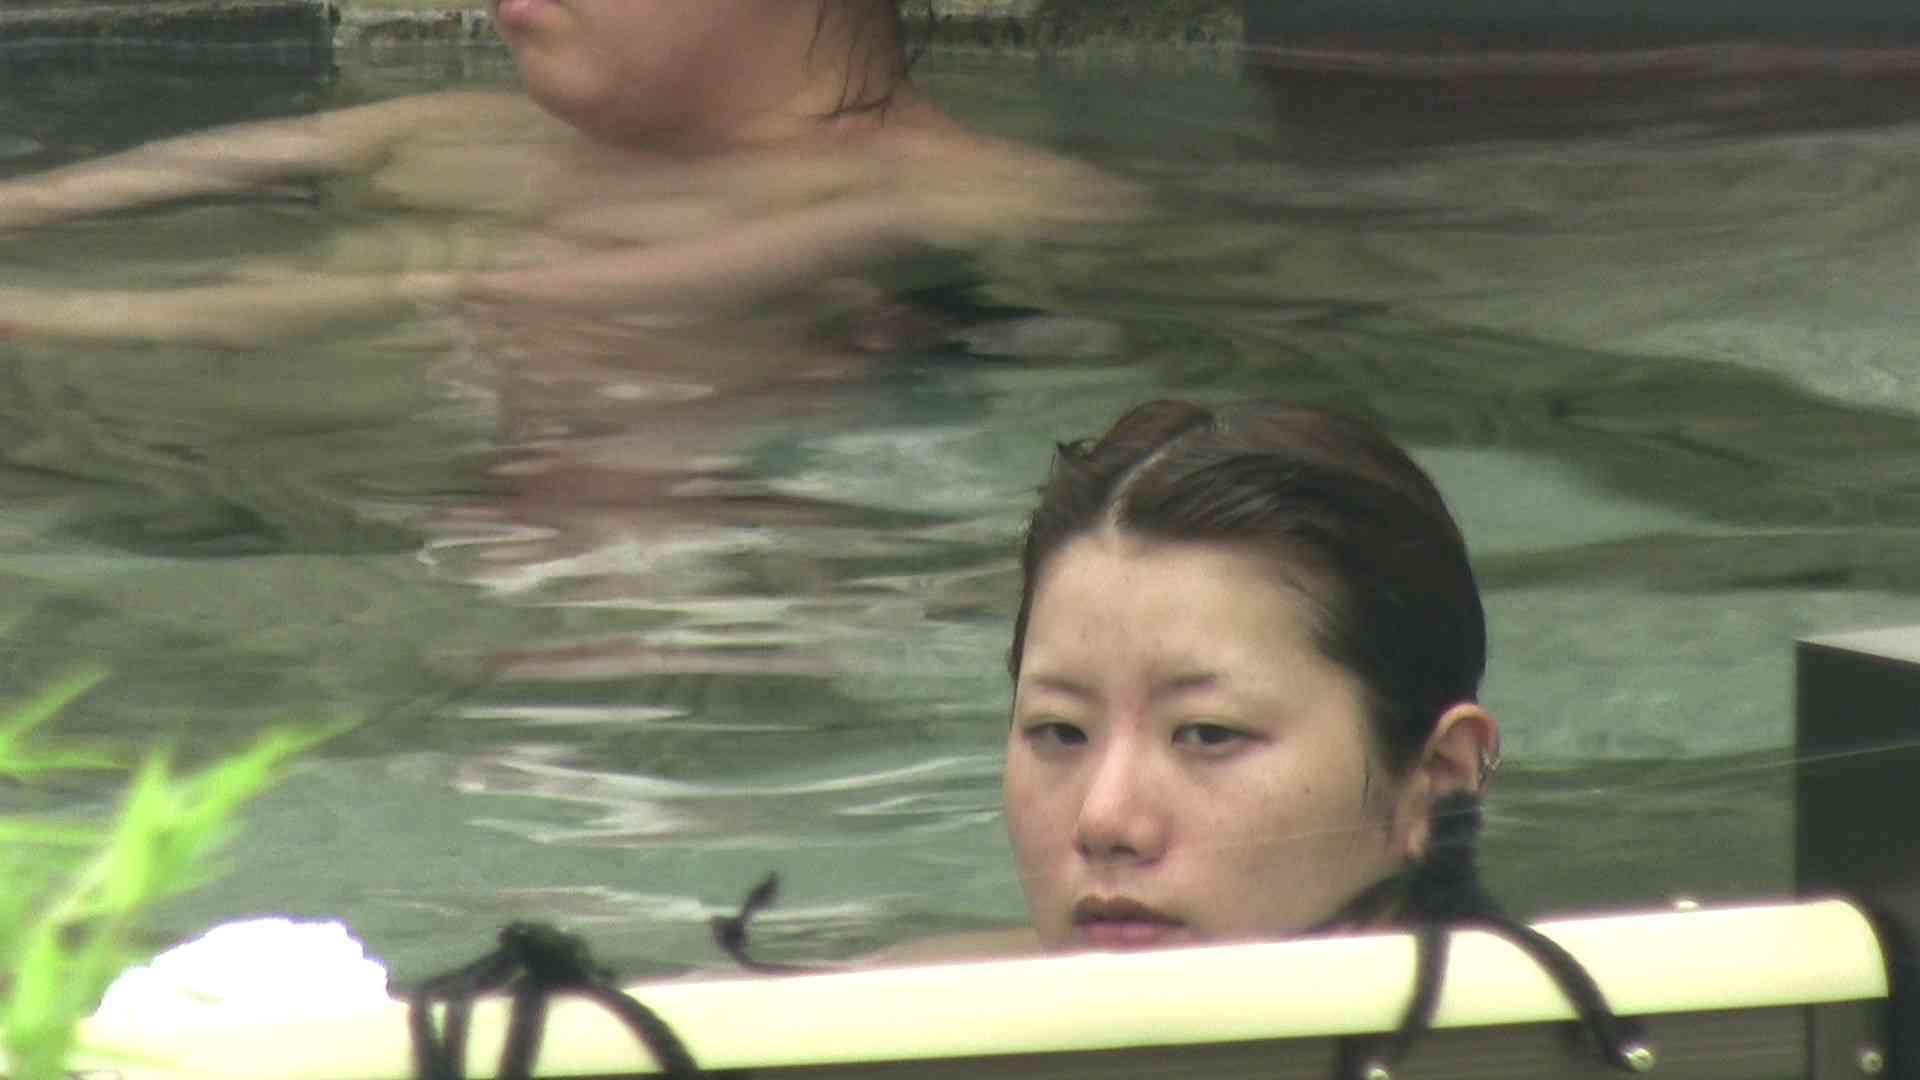 Aquaな露天風呂Vol.19【VIP】 盗撮 | HなOL  88pic 74